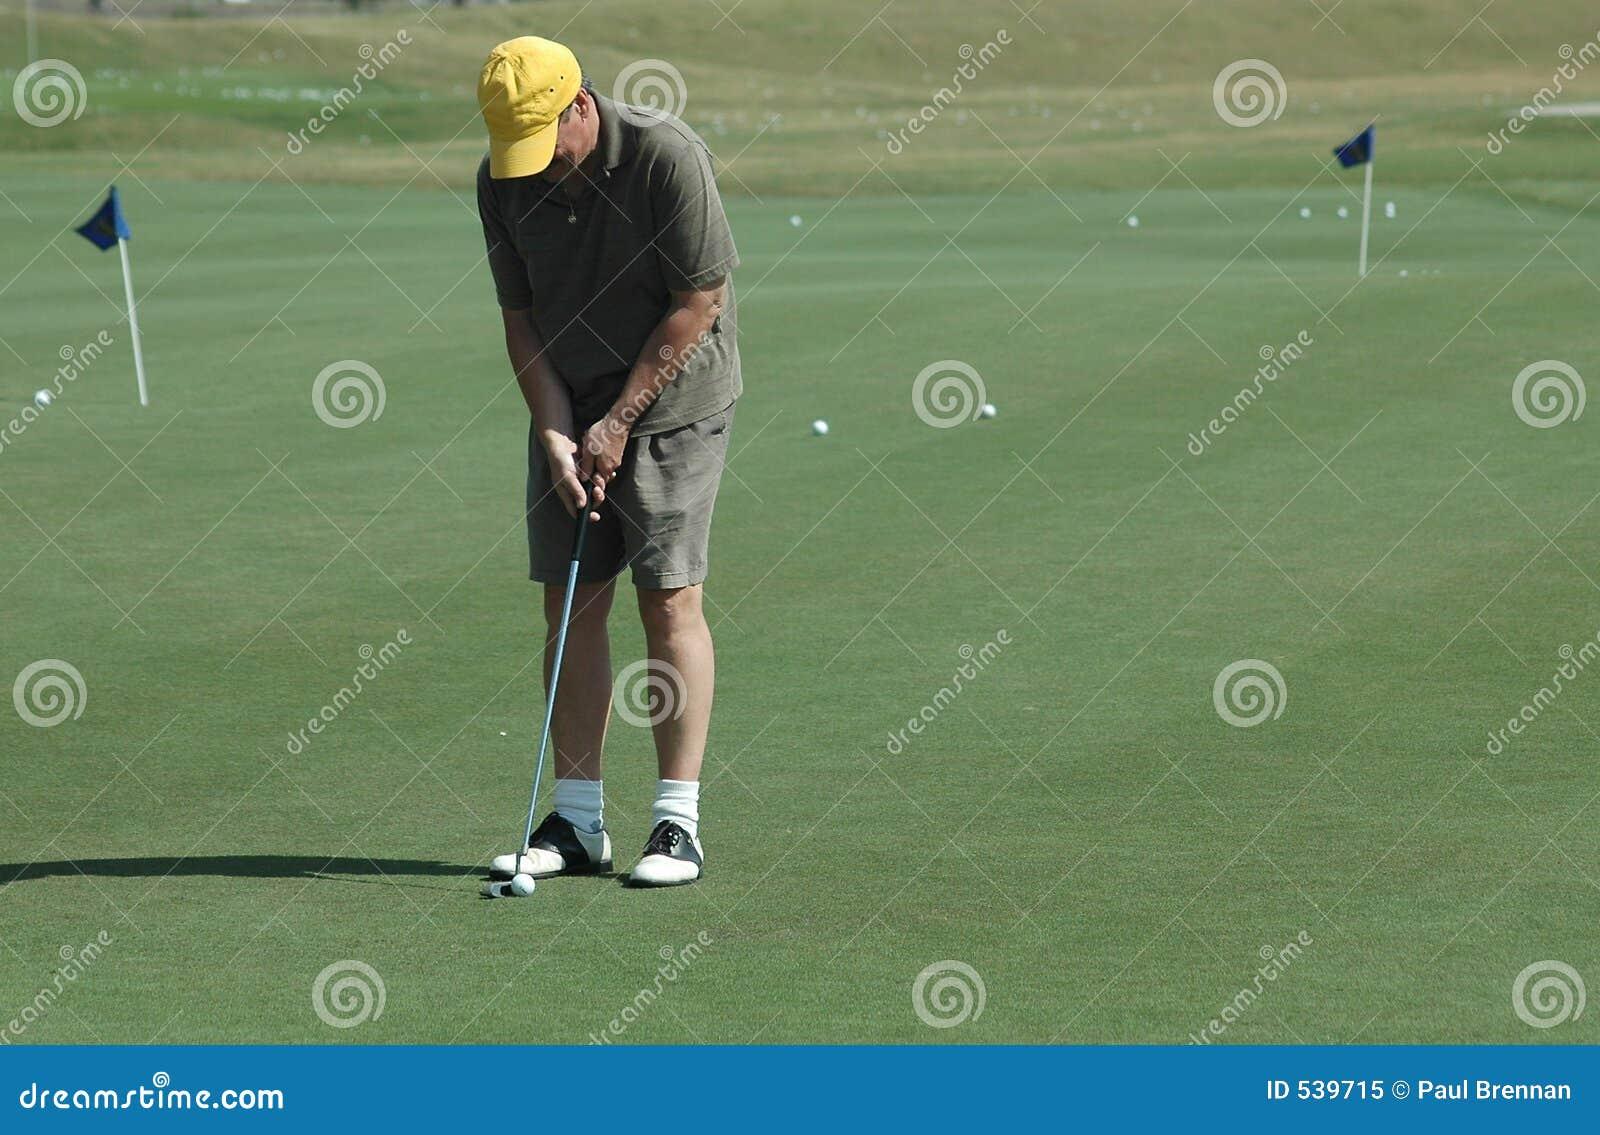 Download 运作放置 库存图片. 图片 包括有 旅行, 放置, 人们, 体育运动, 高尔夫球, 高尔夫球运动员, 俱乐部 - 539715